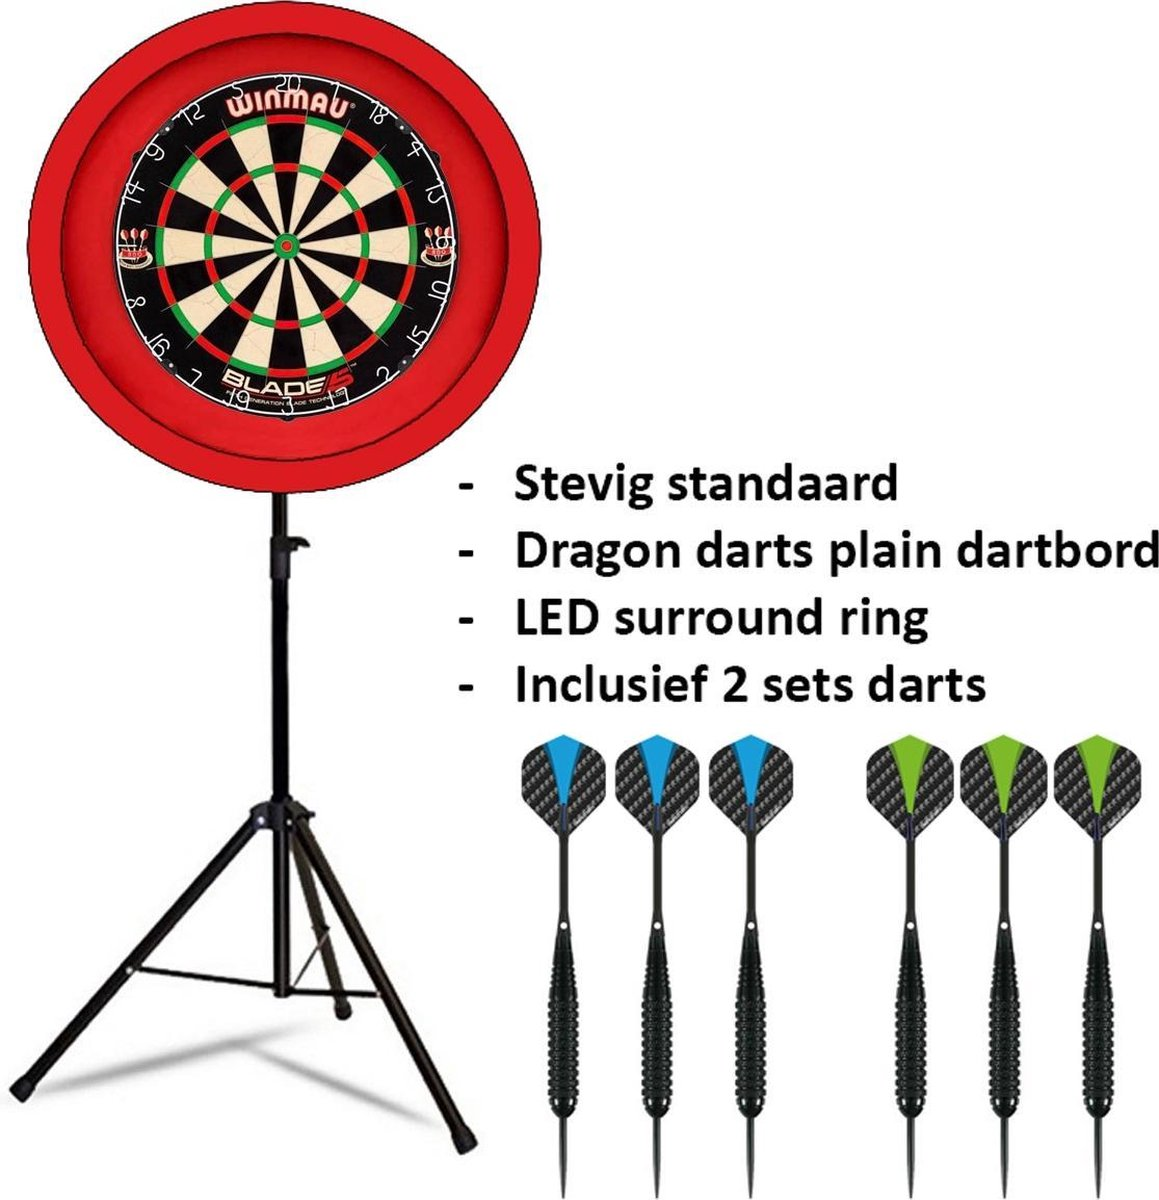 Dragon darts - Portable dartbord standaard LED pakket - inclusief Winmau Blade 5 - dartbord - en - LED surround ring - rood